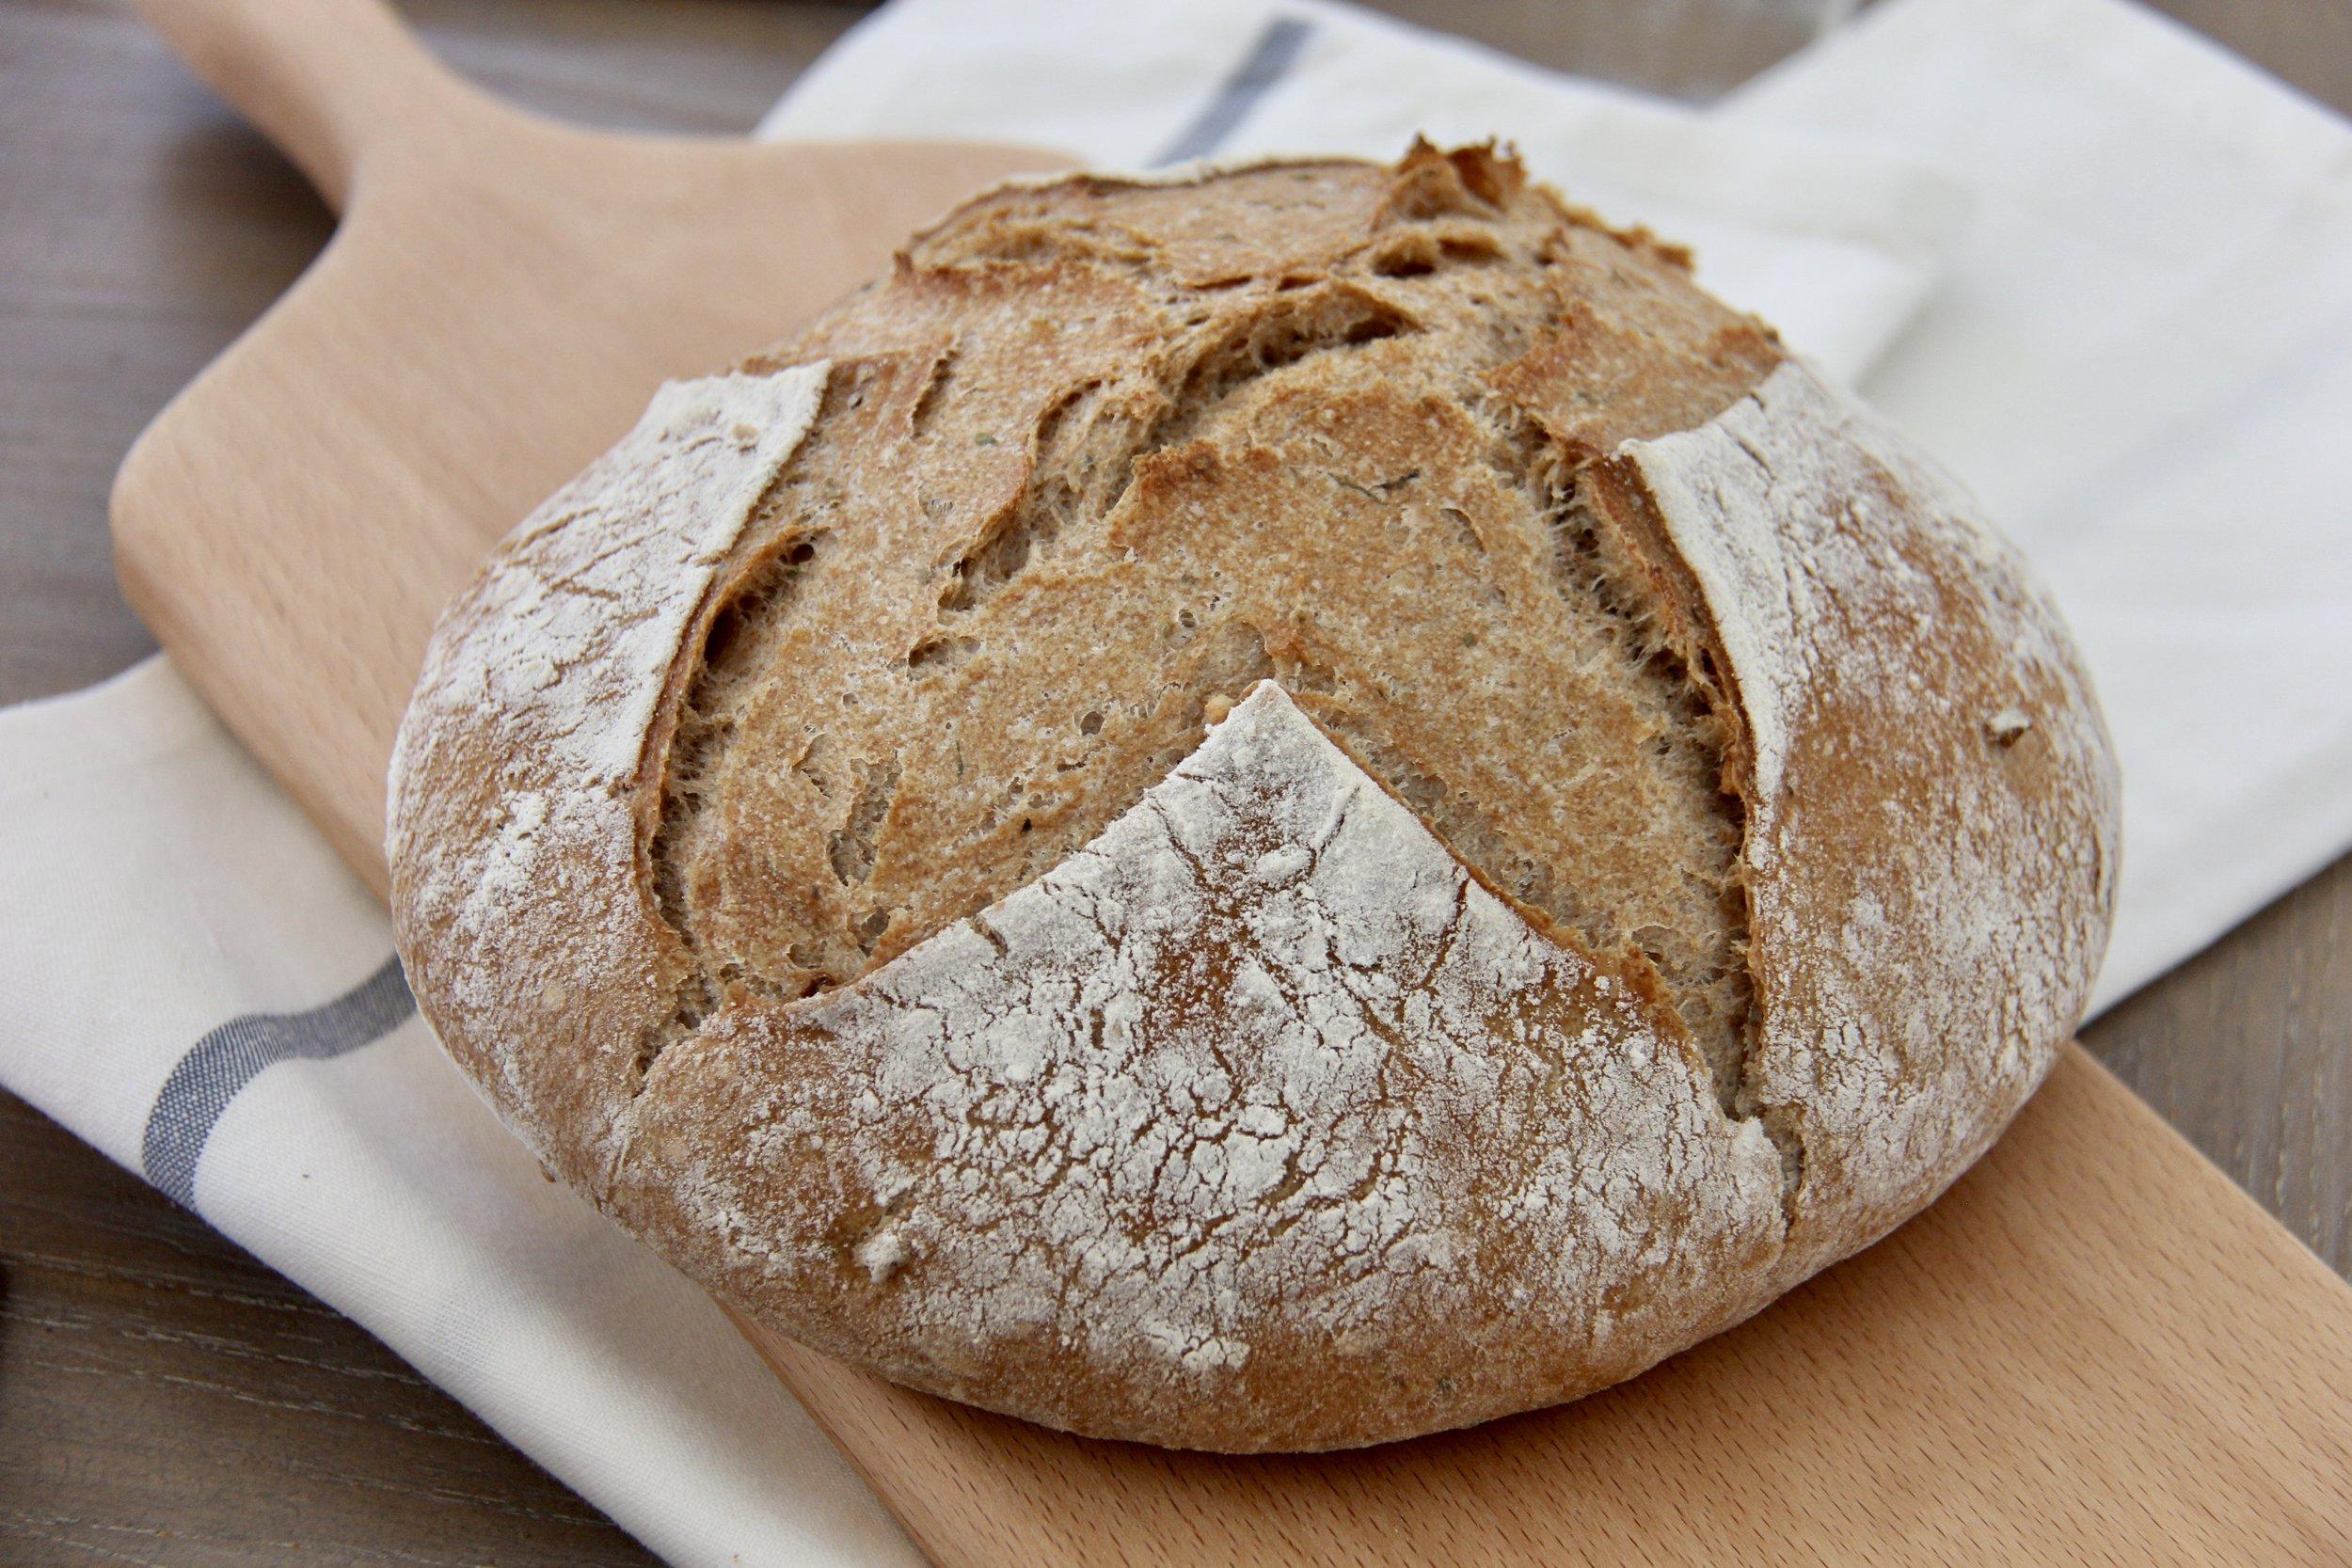 Bry's Whole Wheat Artisan Bread